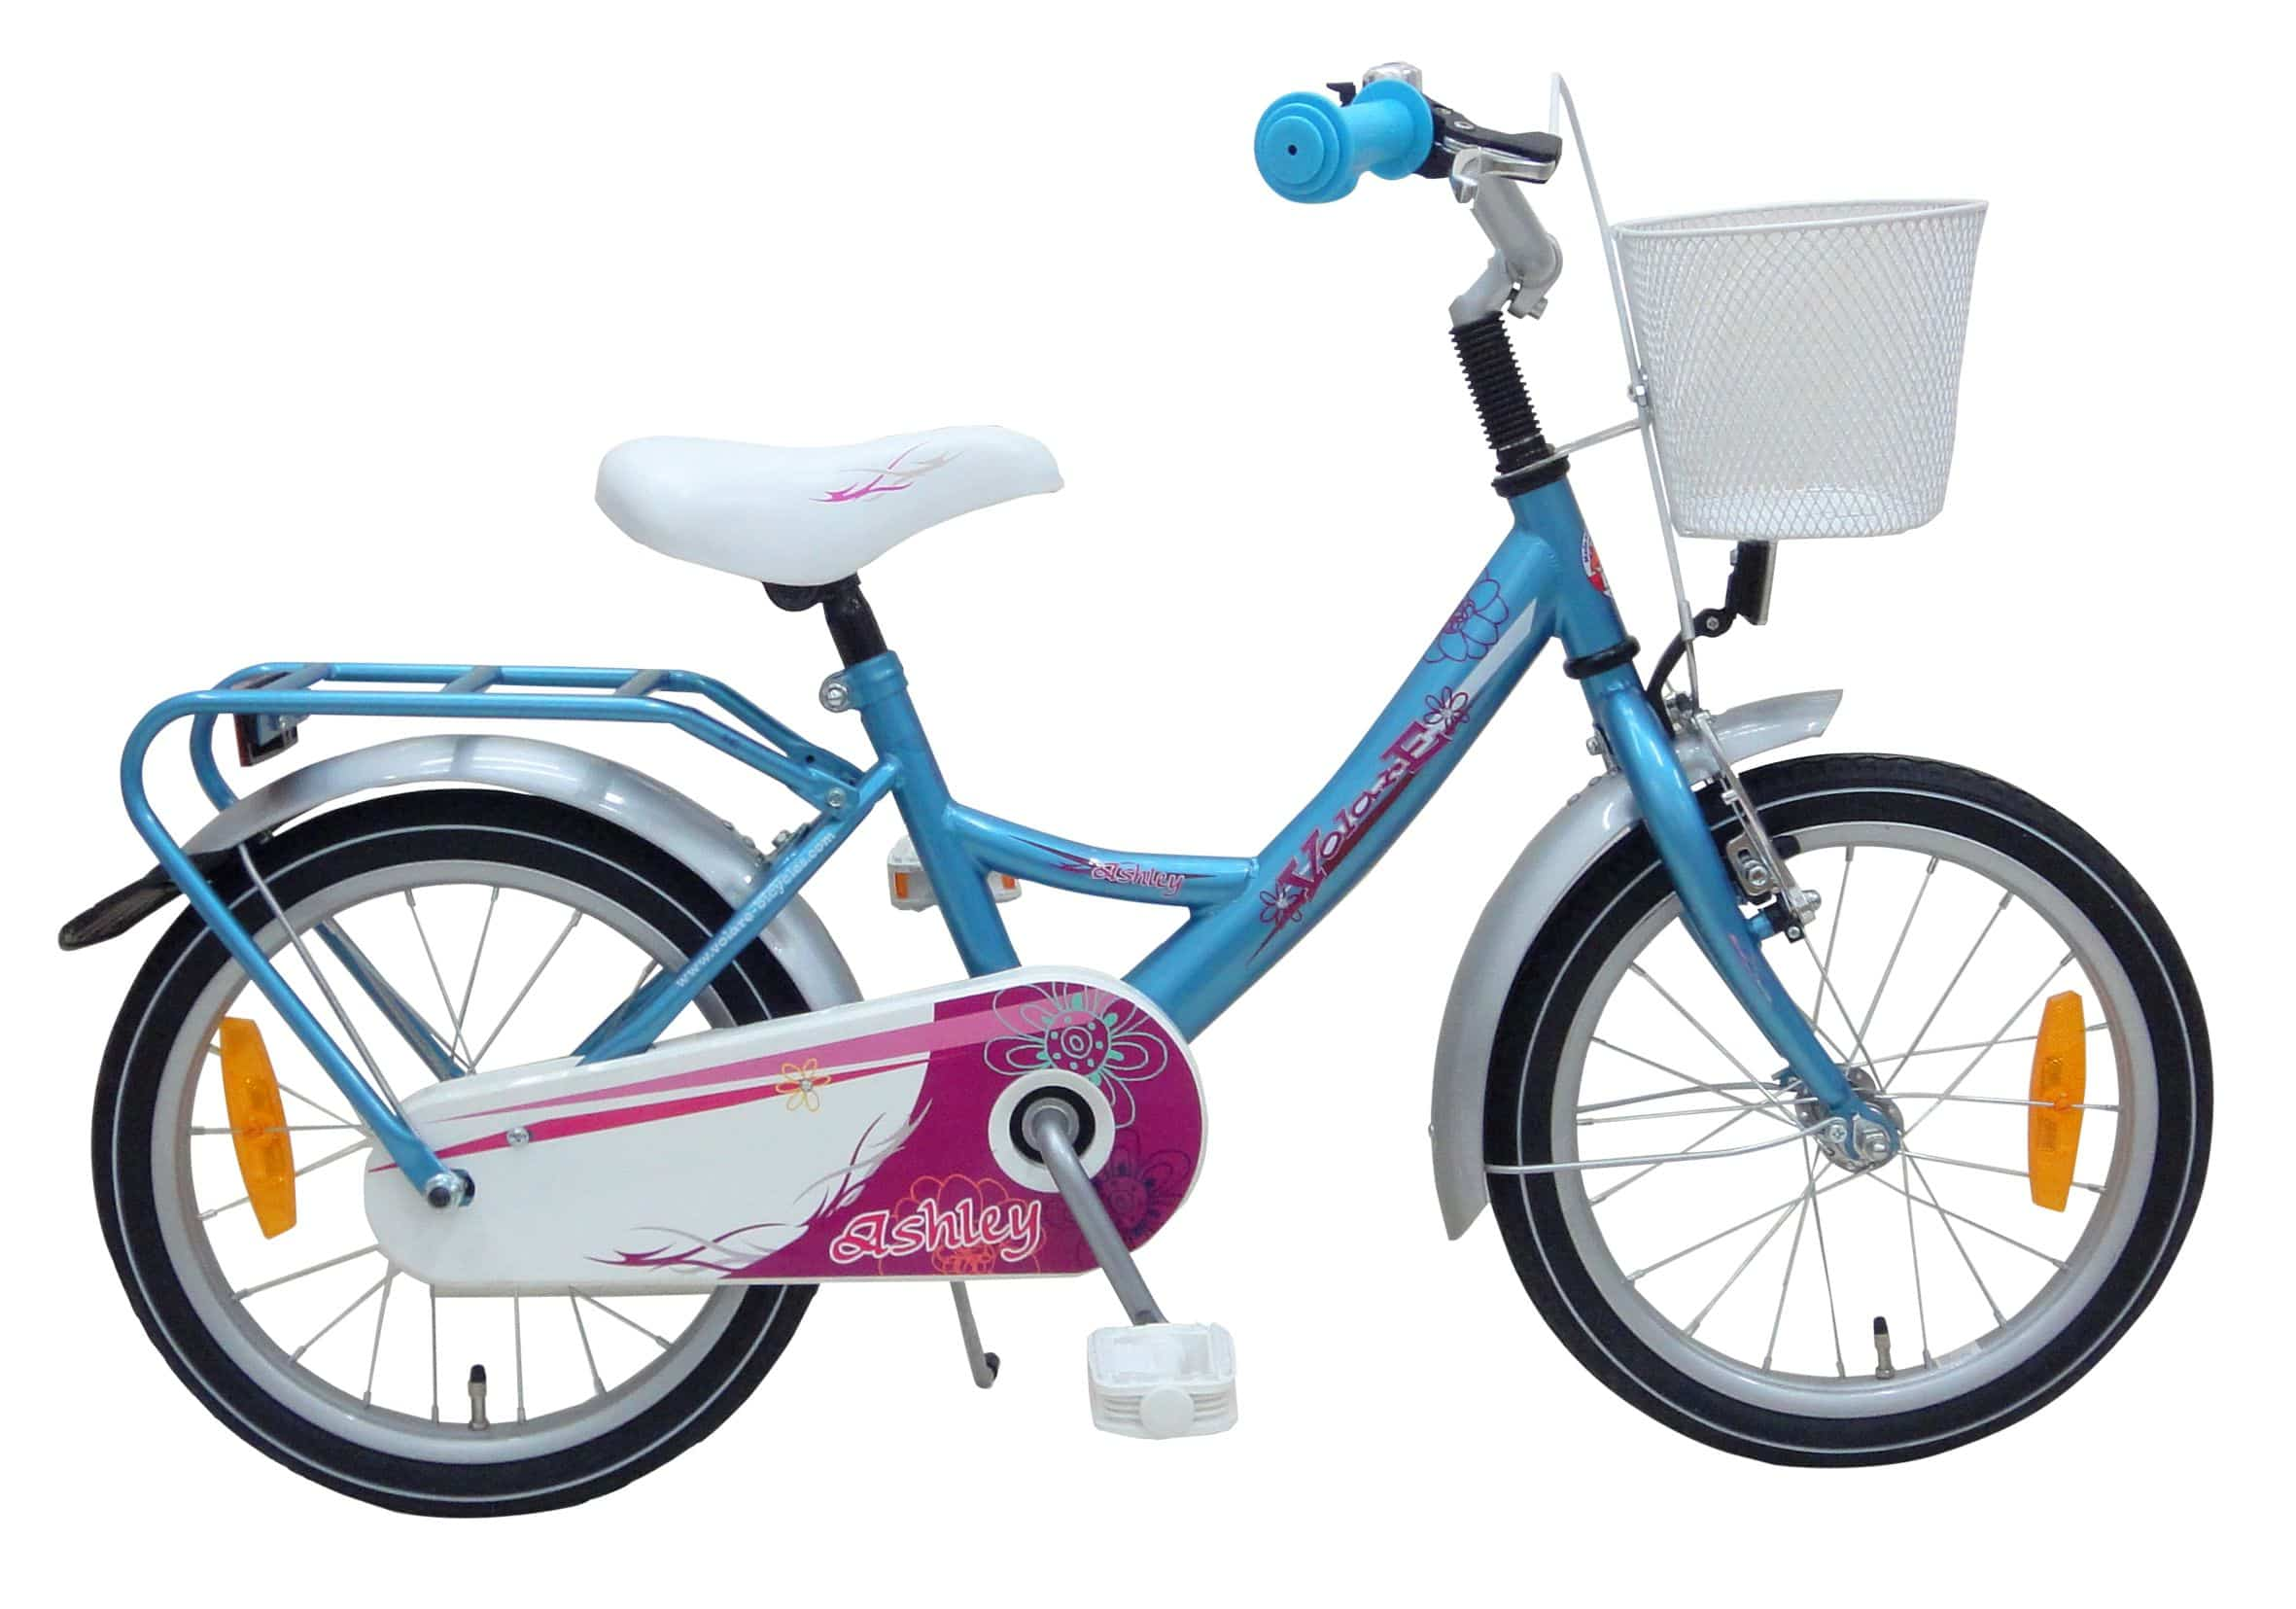 fahrrad 16 zoll ashley blau wei pink kaufen. Black Bedroom Furniture Sets. Home Design Ideas